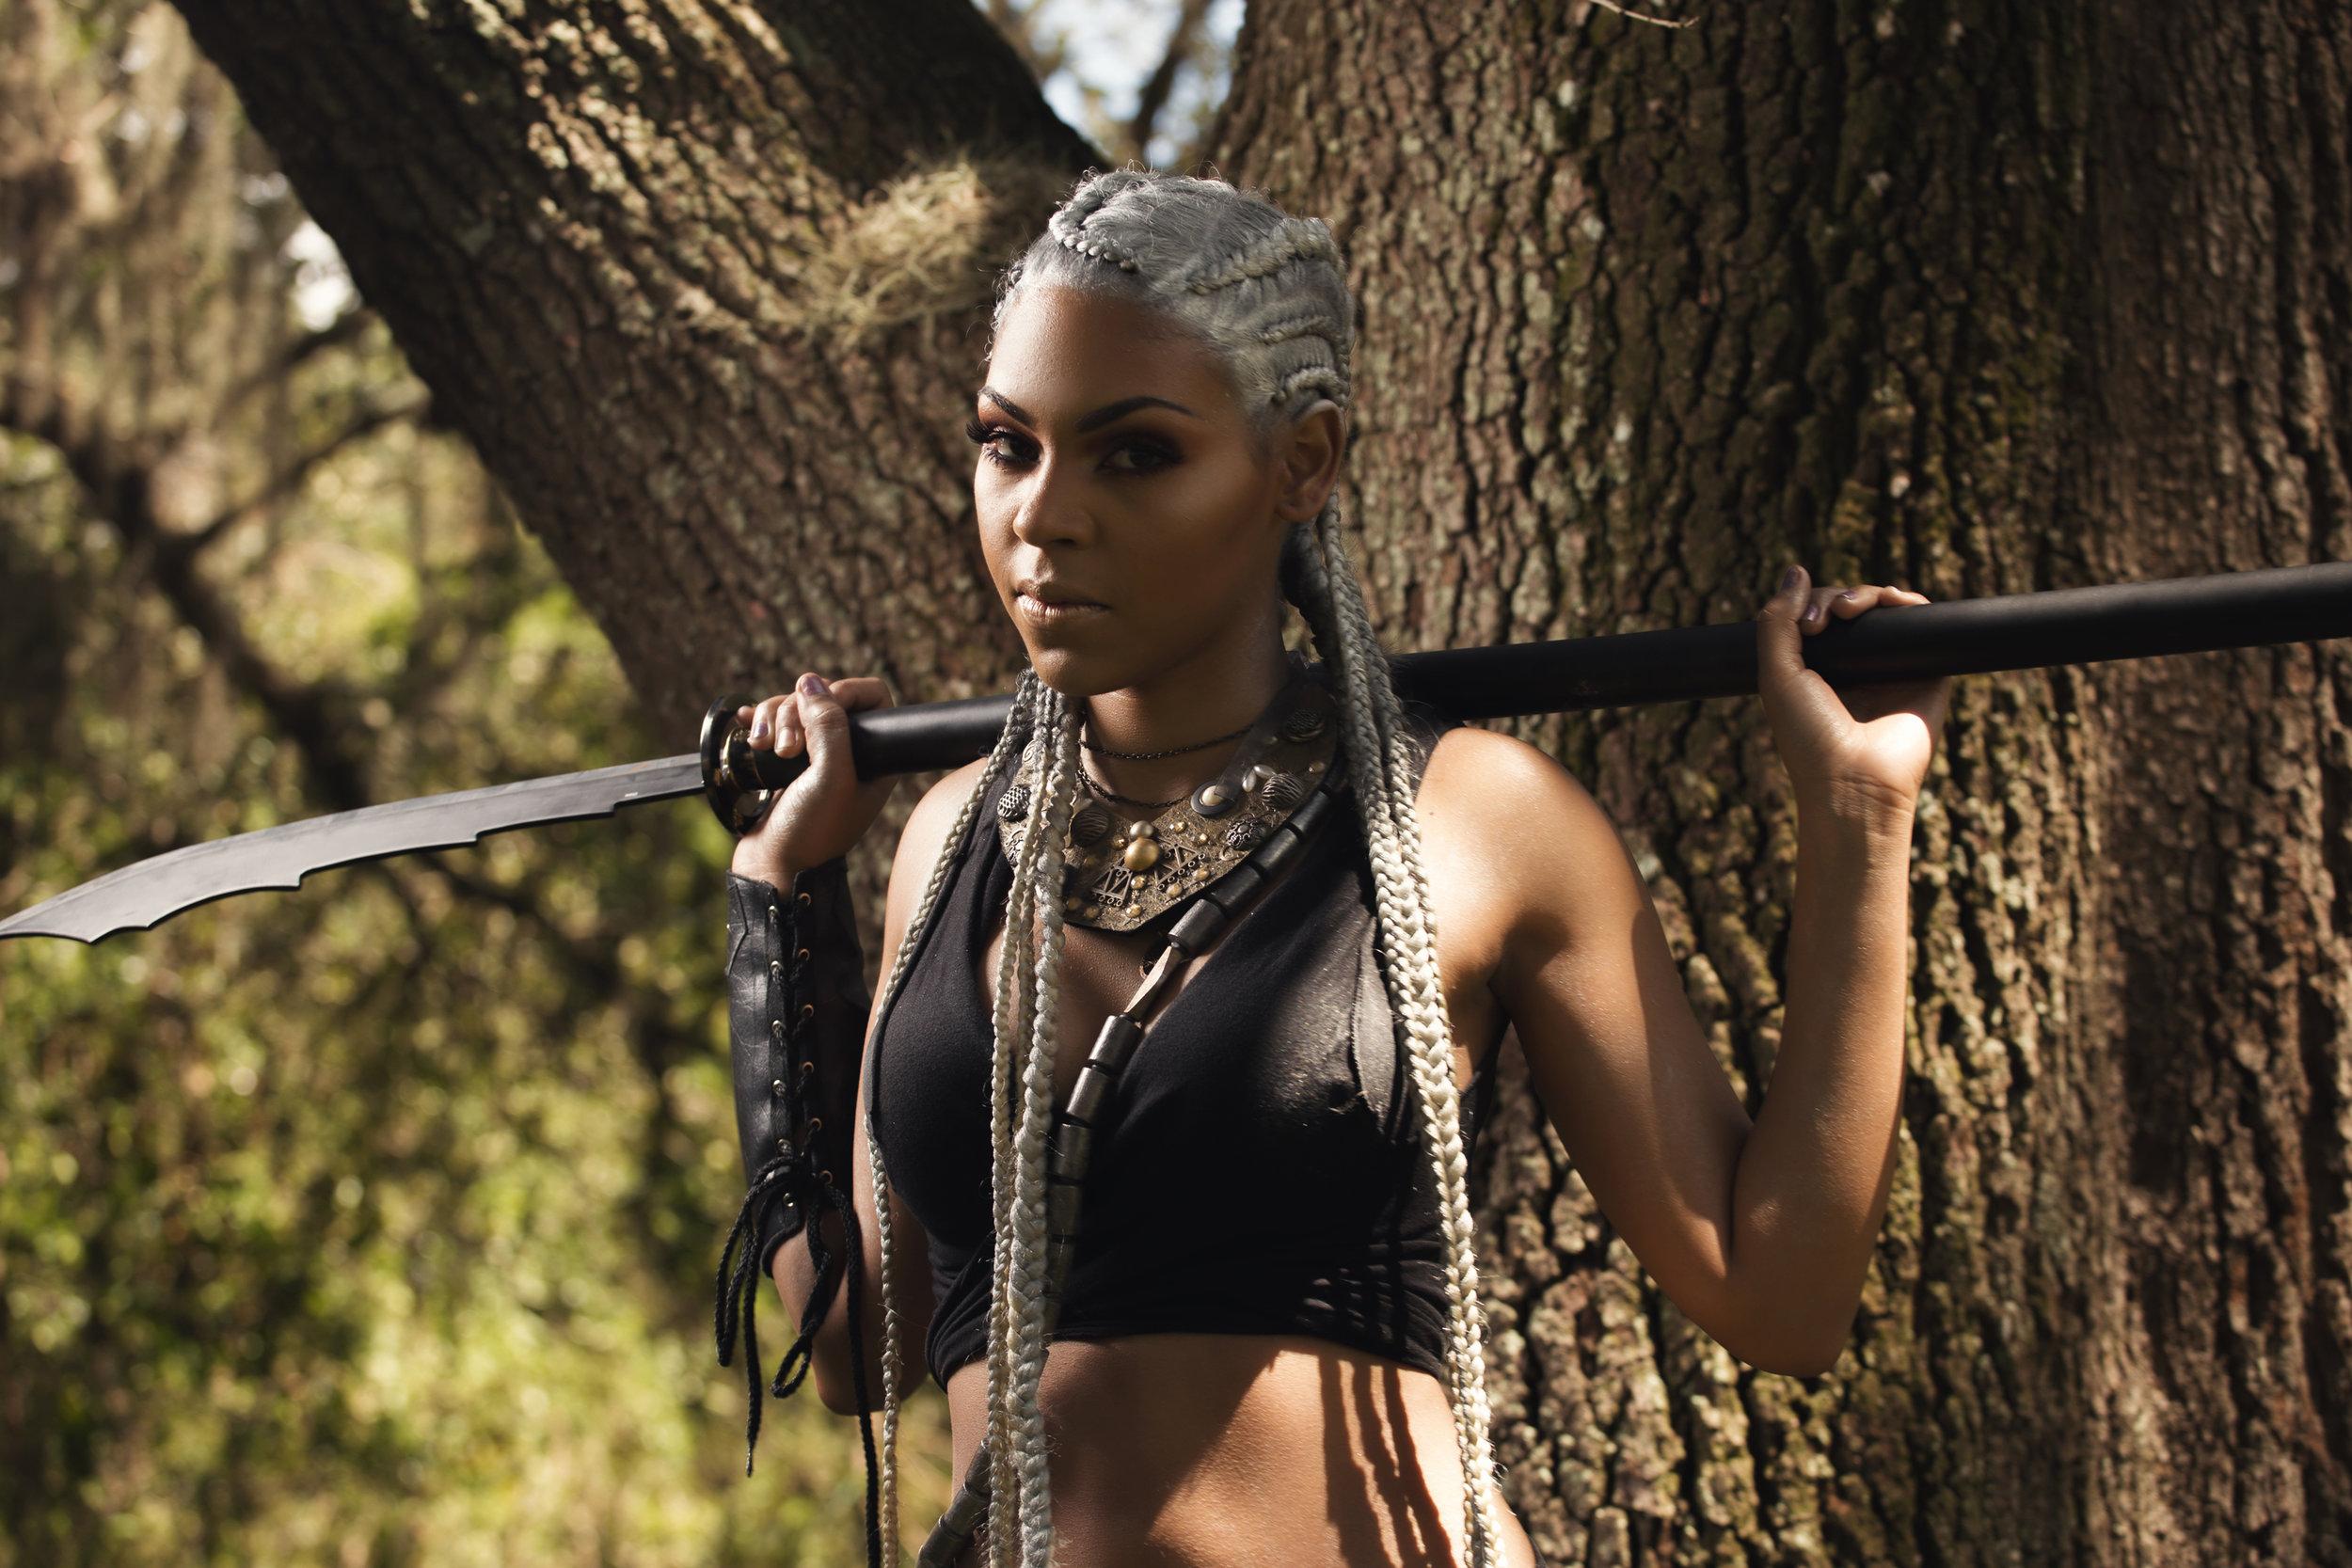 character-chamber-photography-warrior-female8.jpg